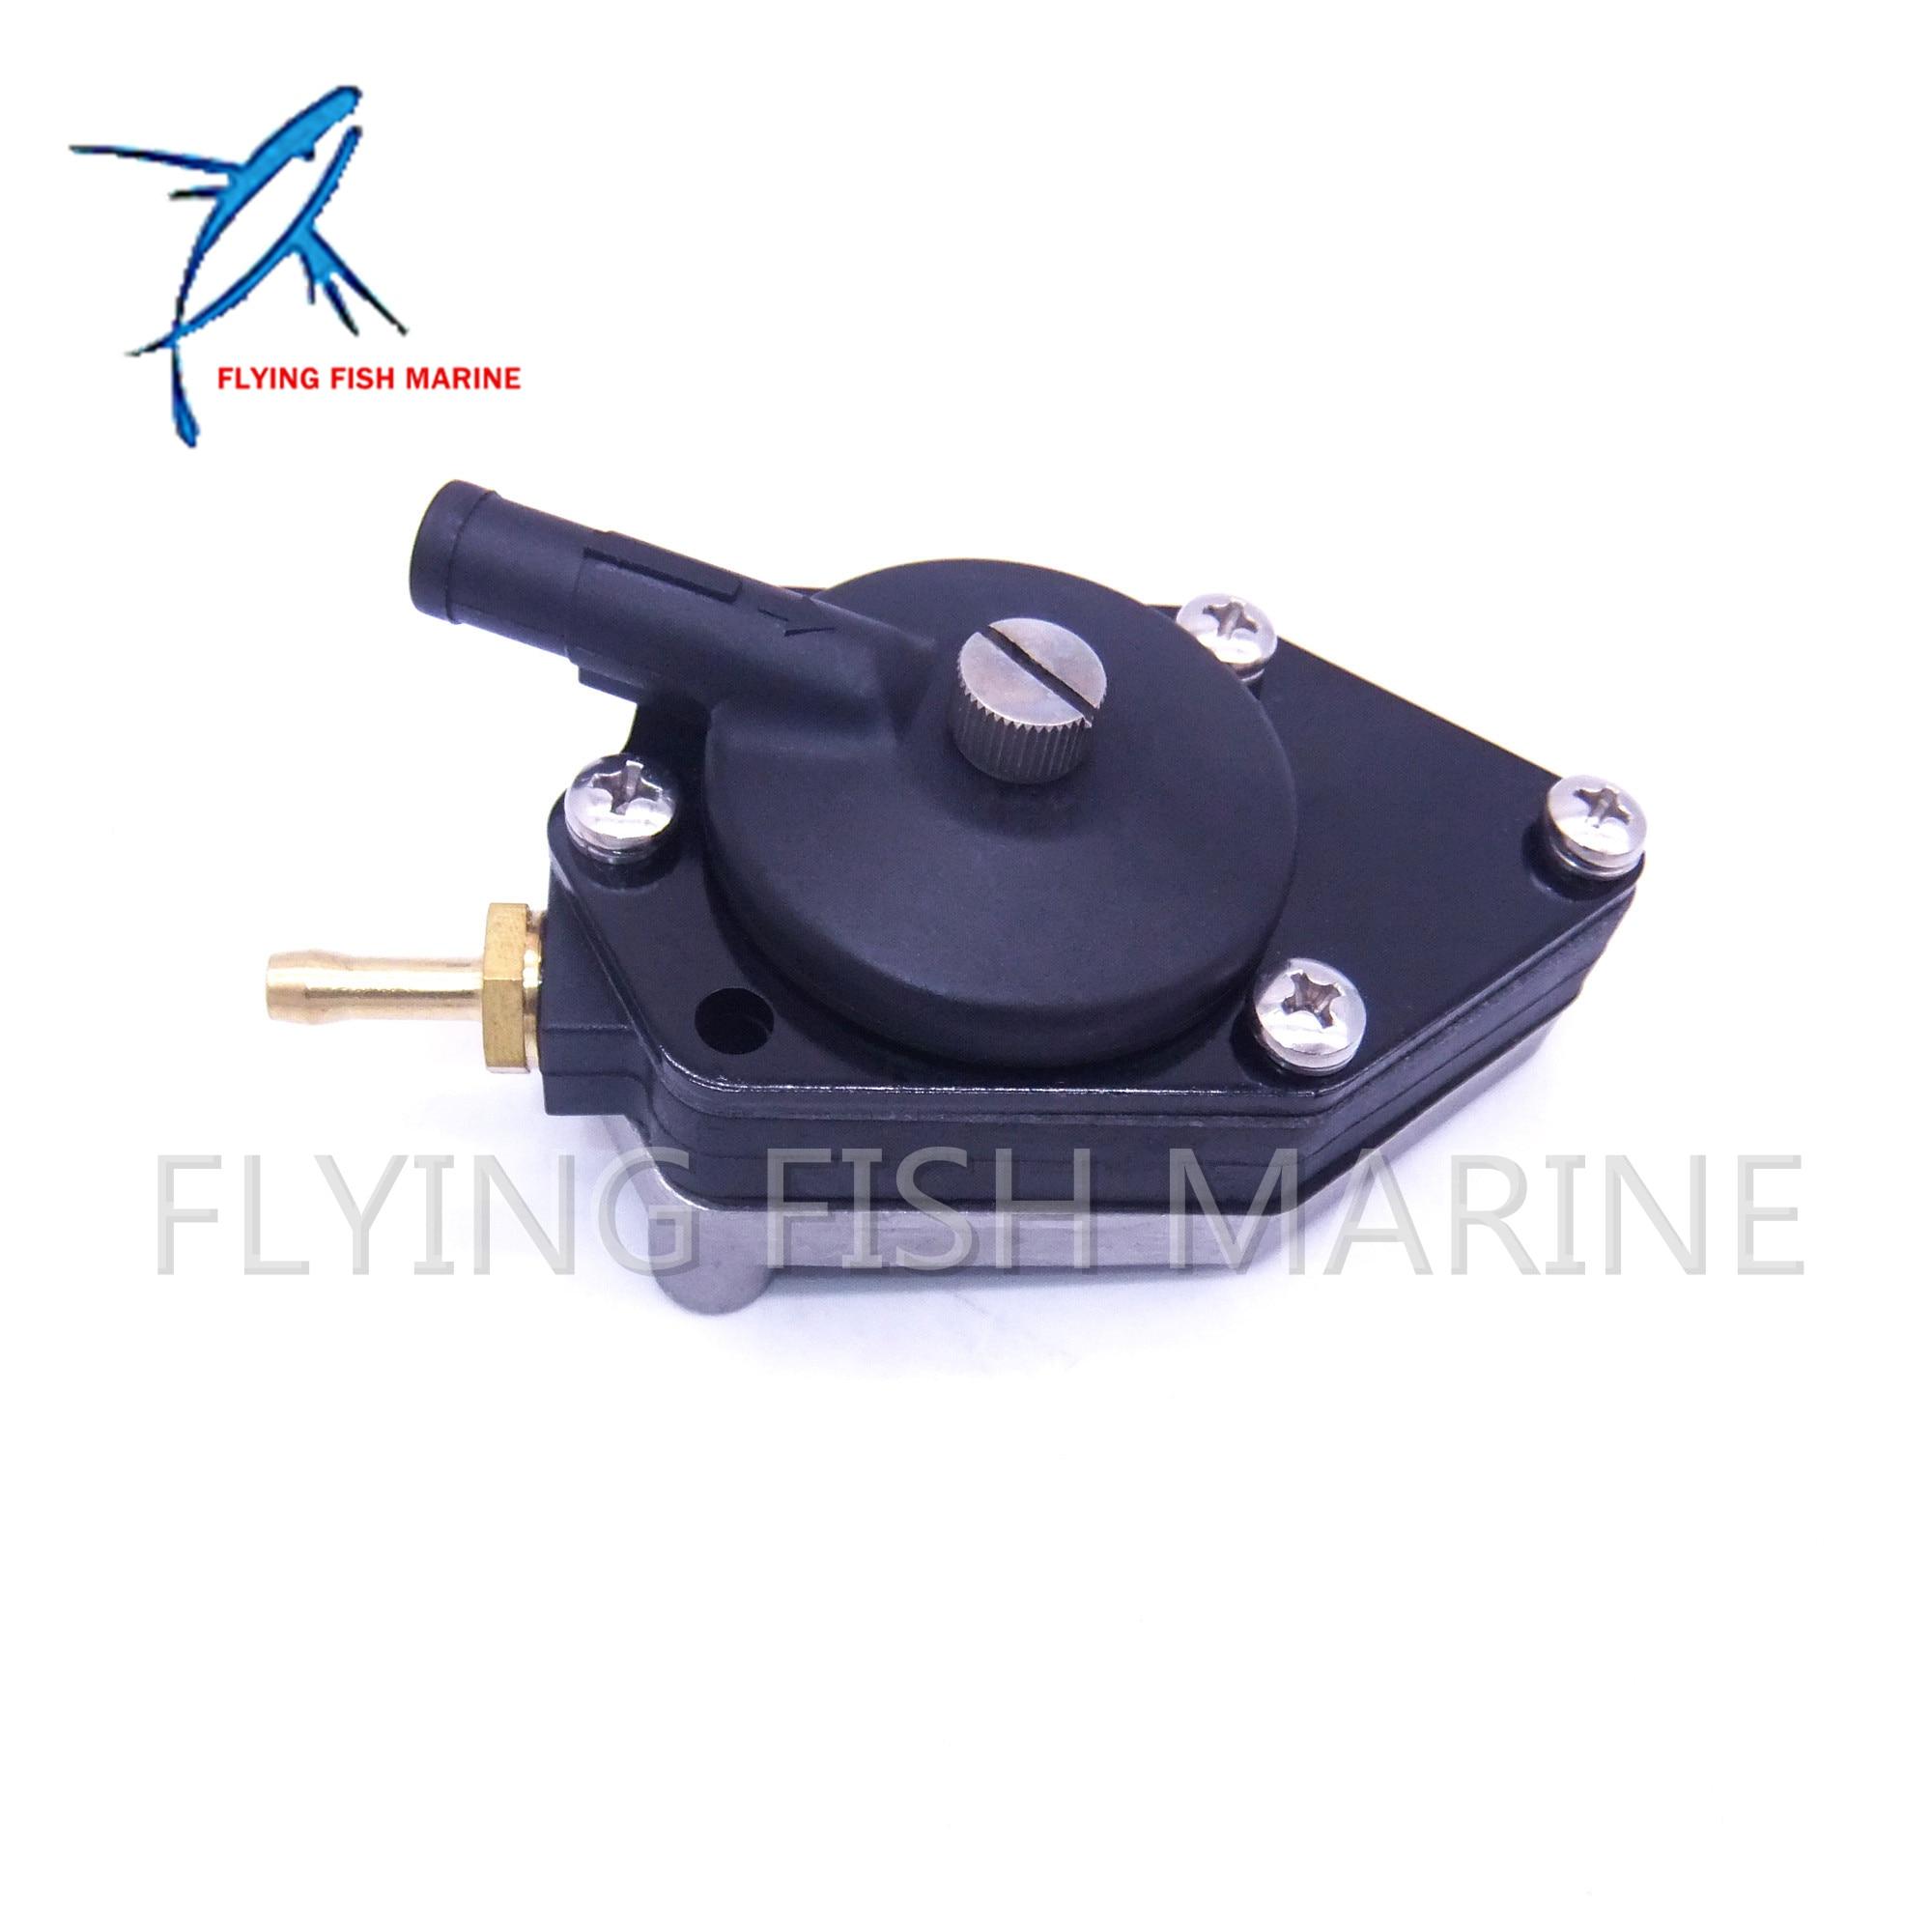 Nordyne Air Handler Wiring Diagram 921145. . Wiring Diagram on